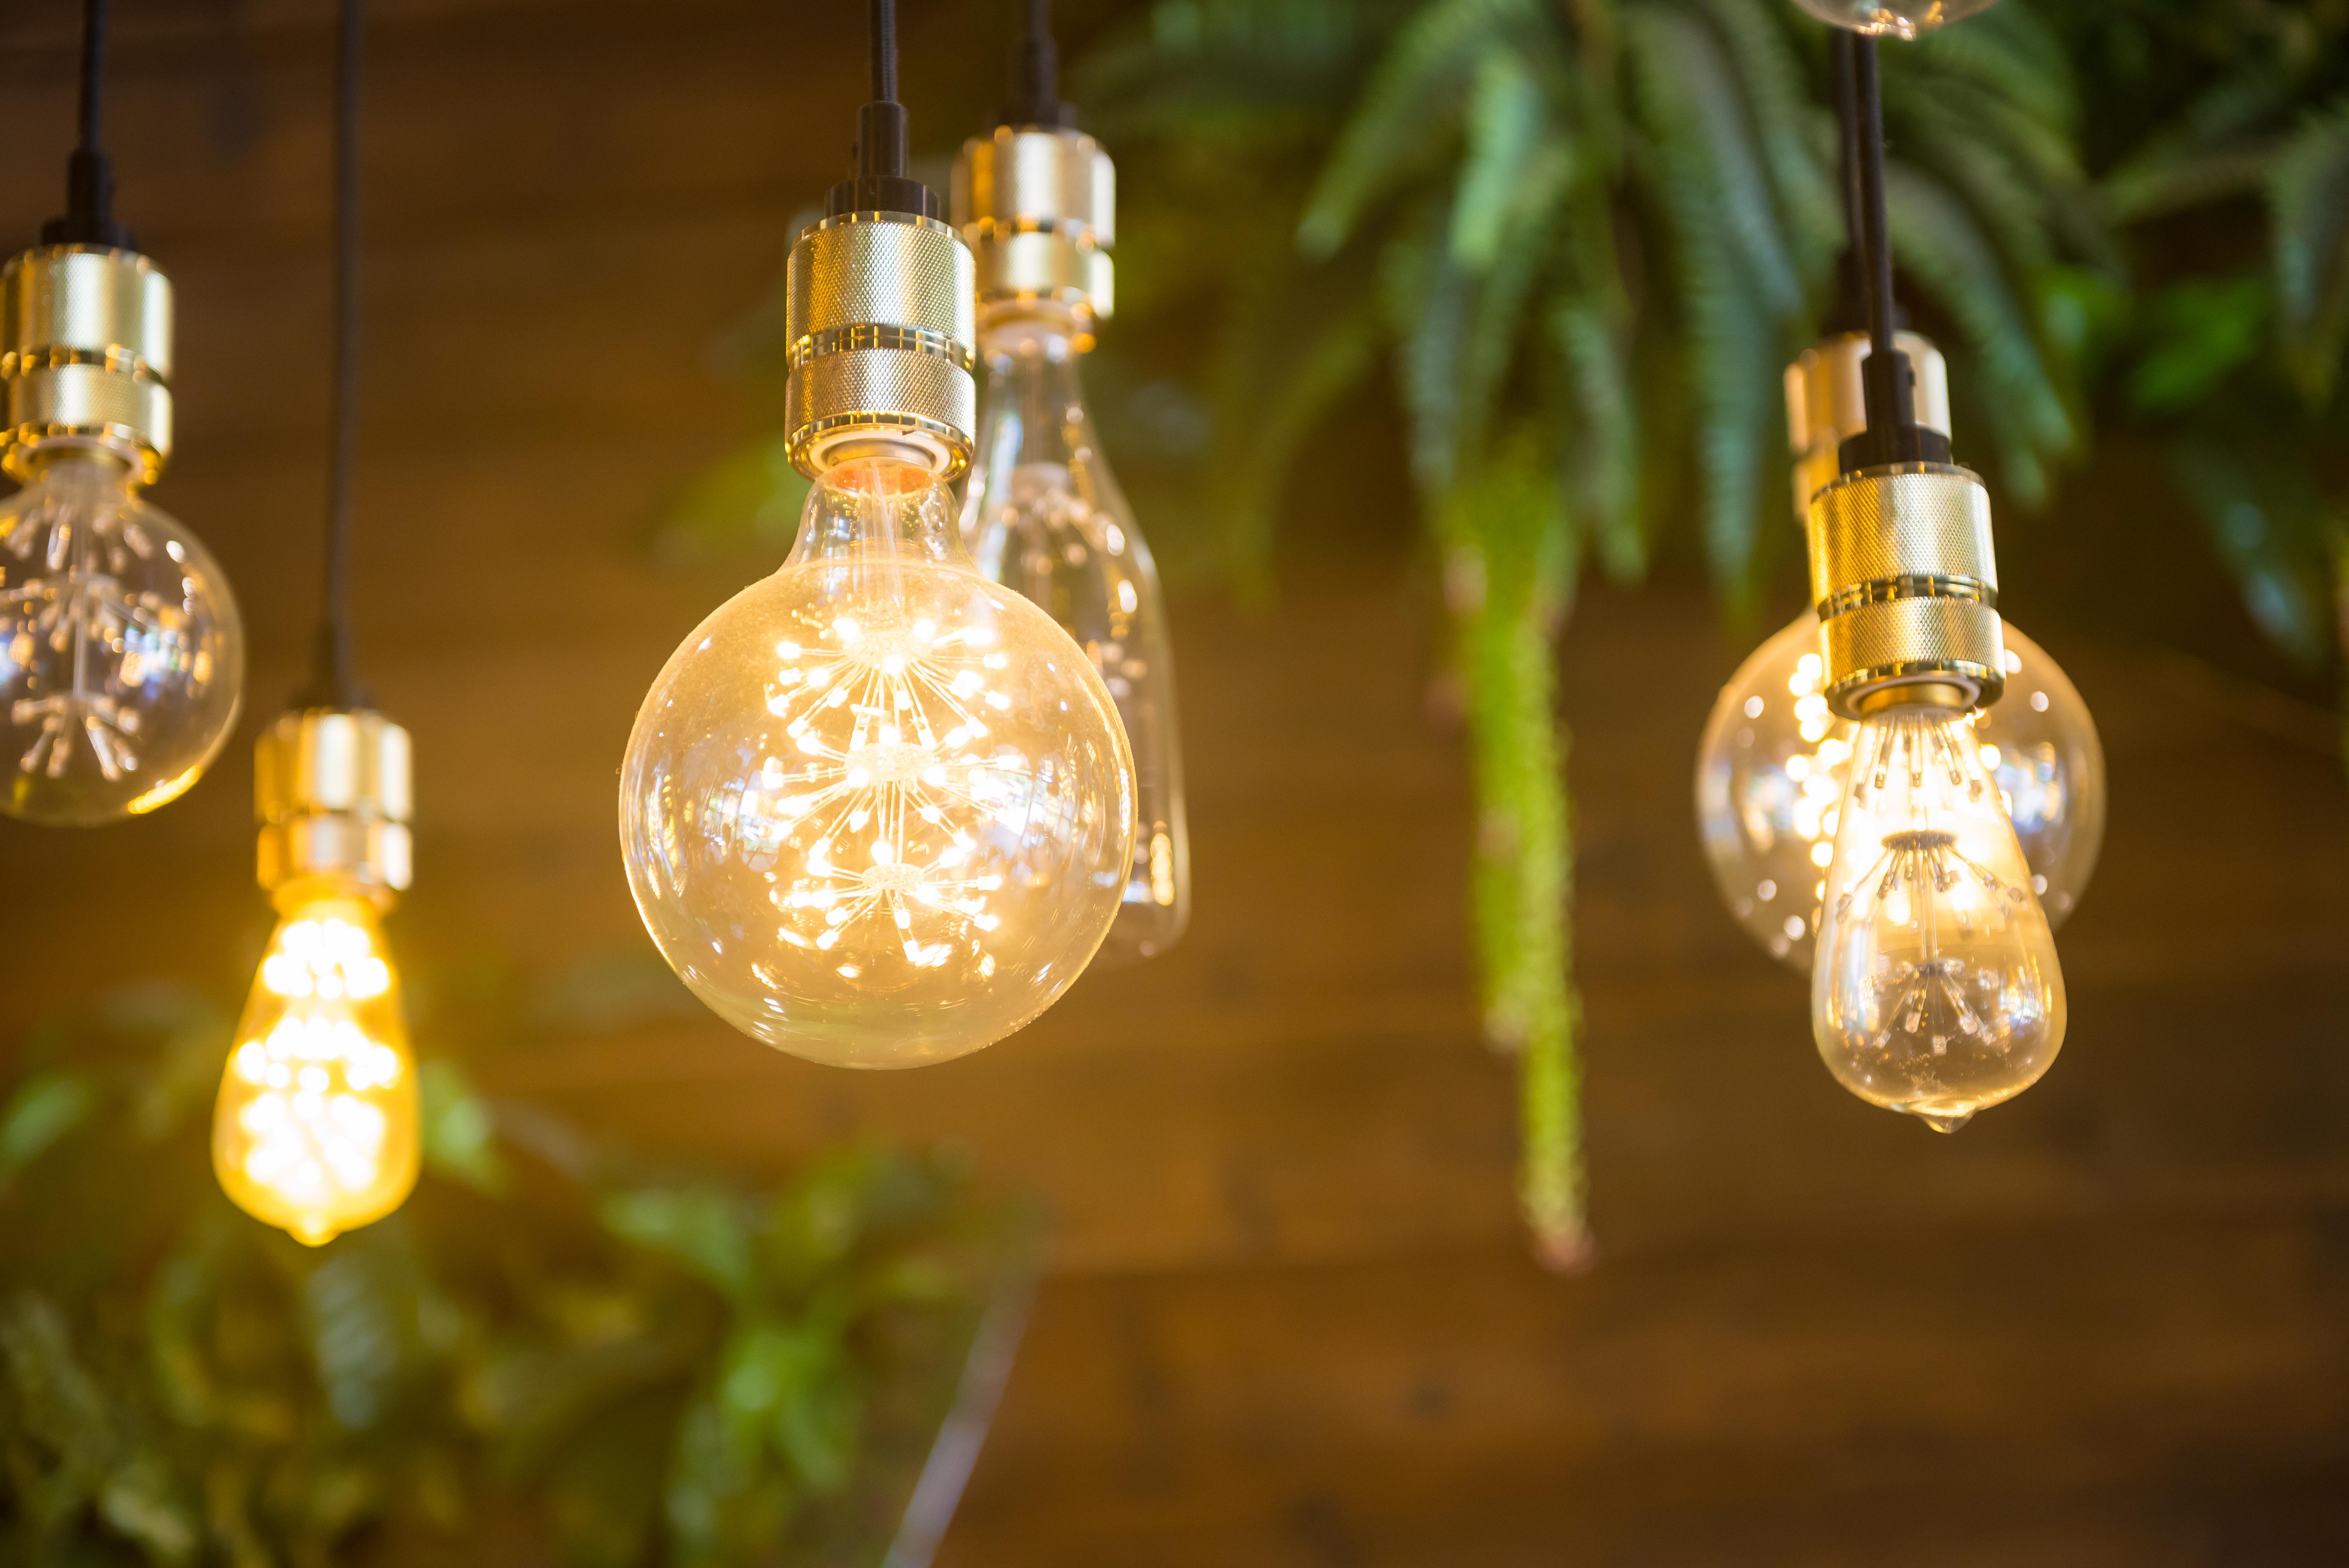 reccessed light bulbs